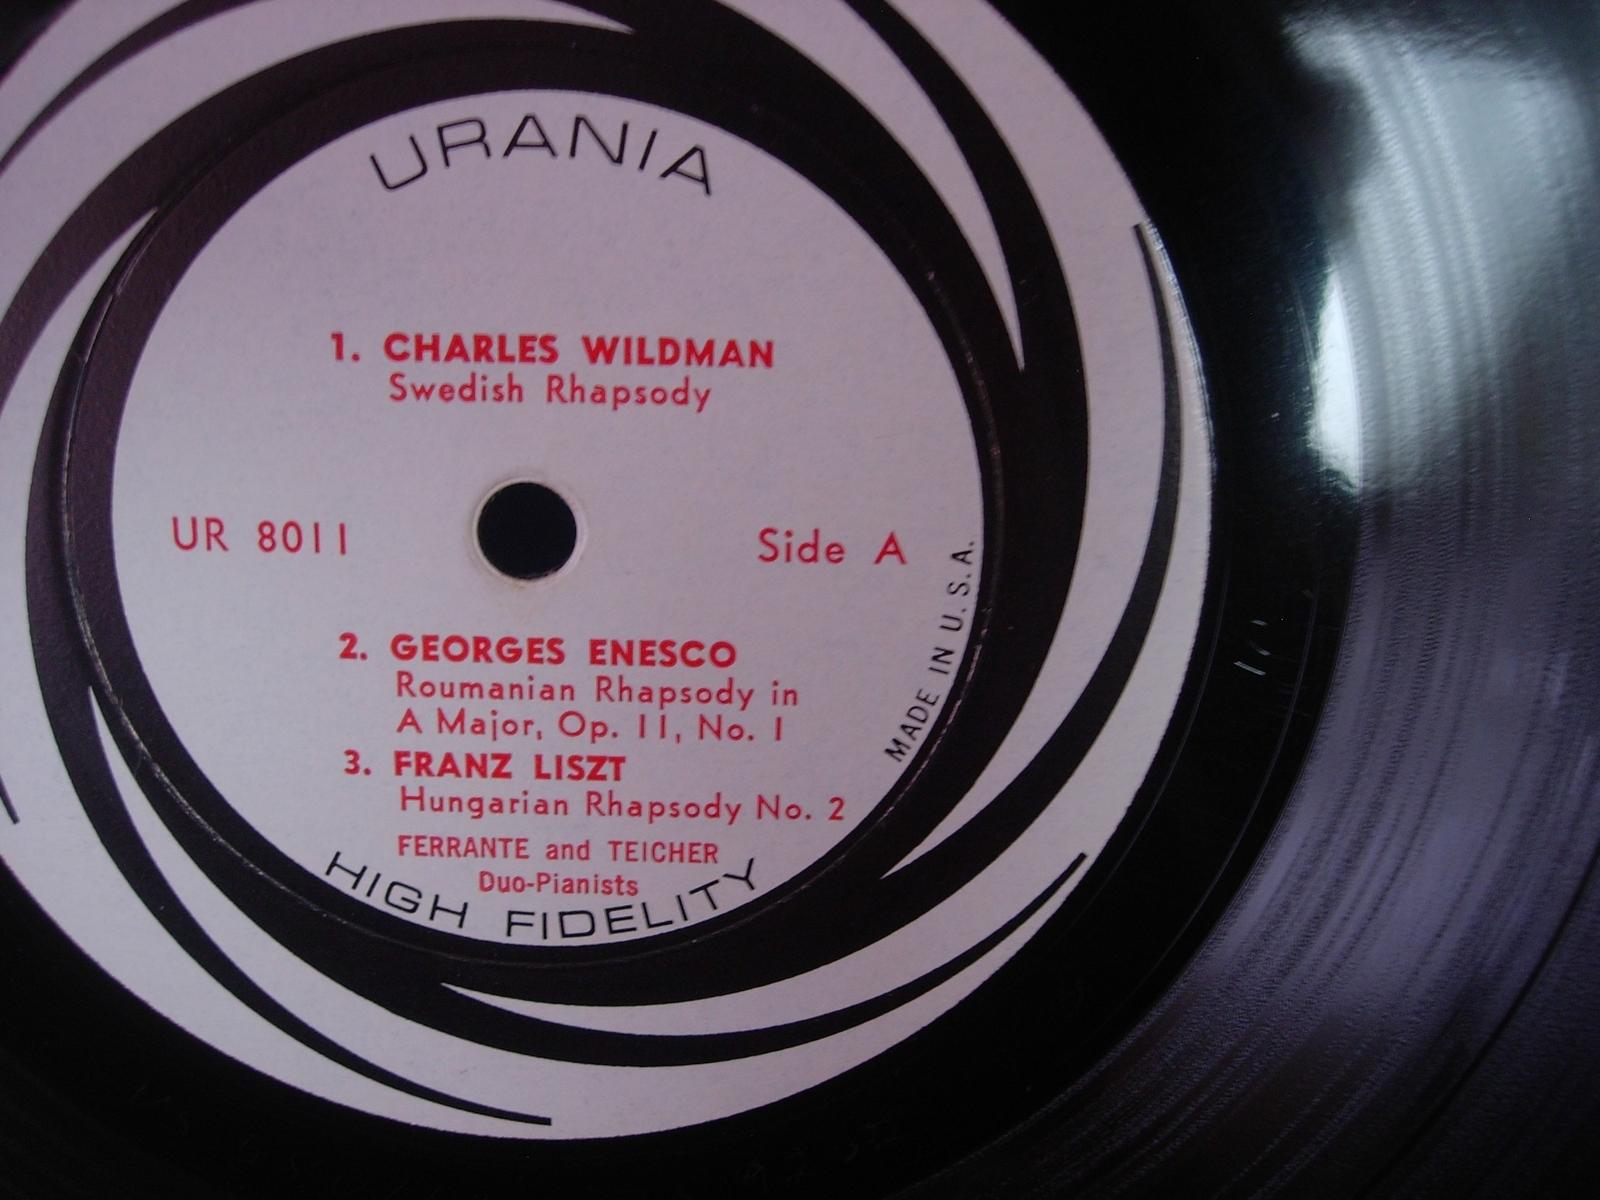 Ferrante and Teicher and their Magic Pianos - Rhapsody - Urania Records UR 8011